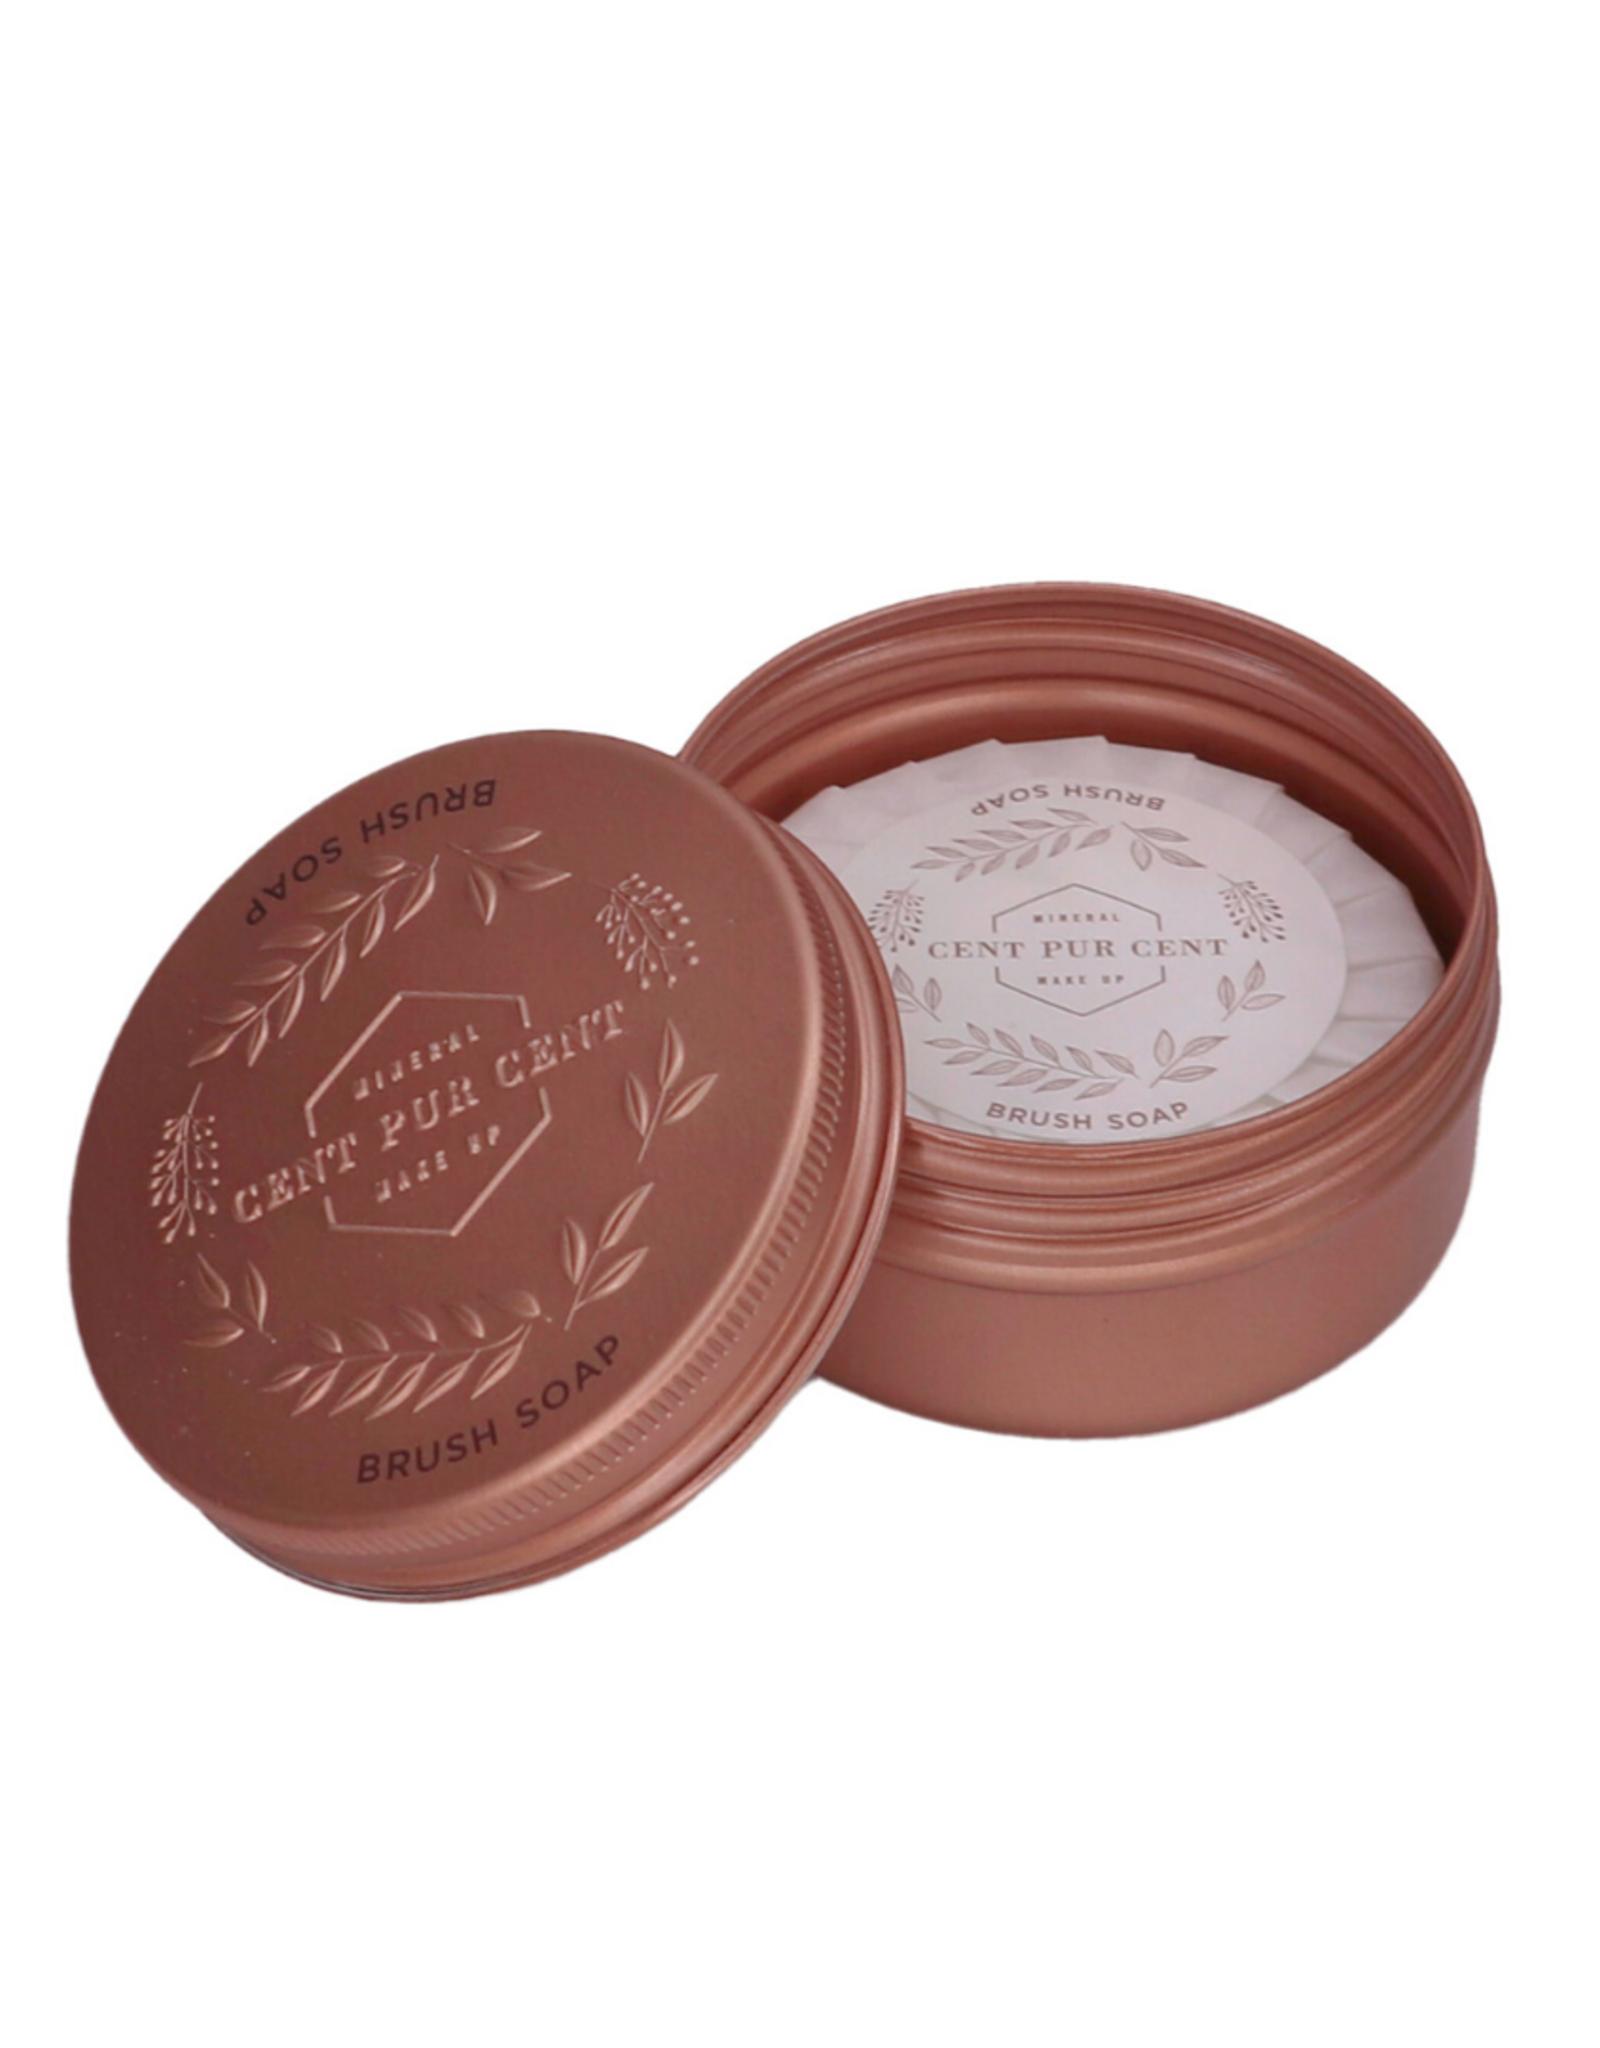 CentpurCent Cent pur Cent - Brush Soap